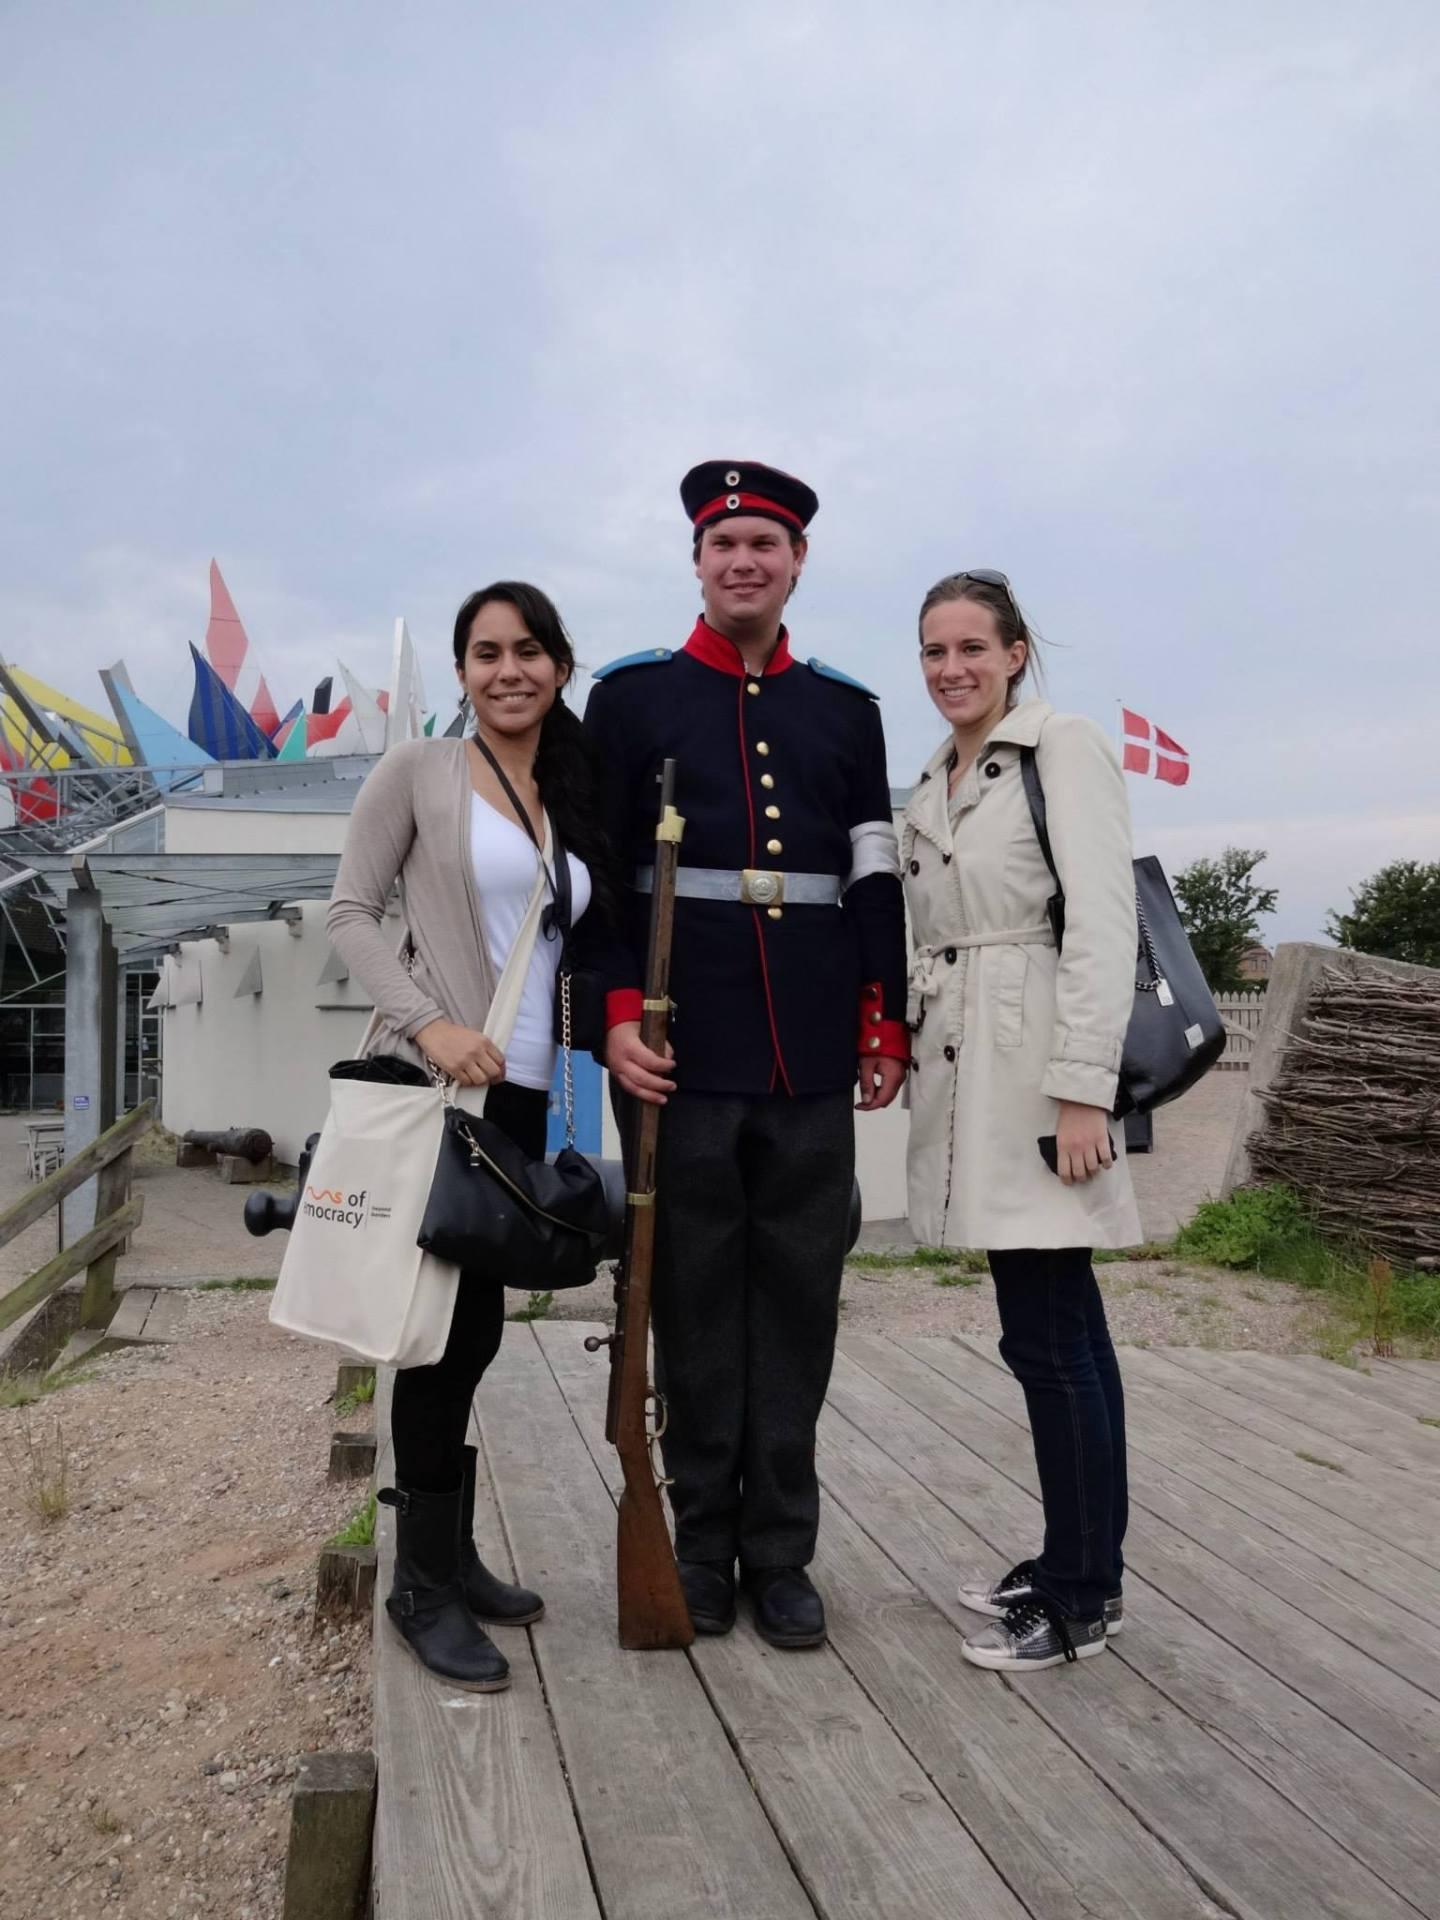 Denmark - Culture